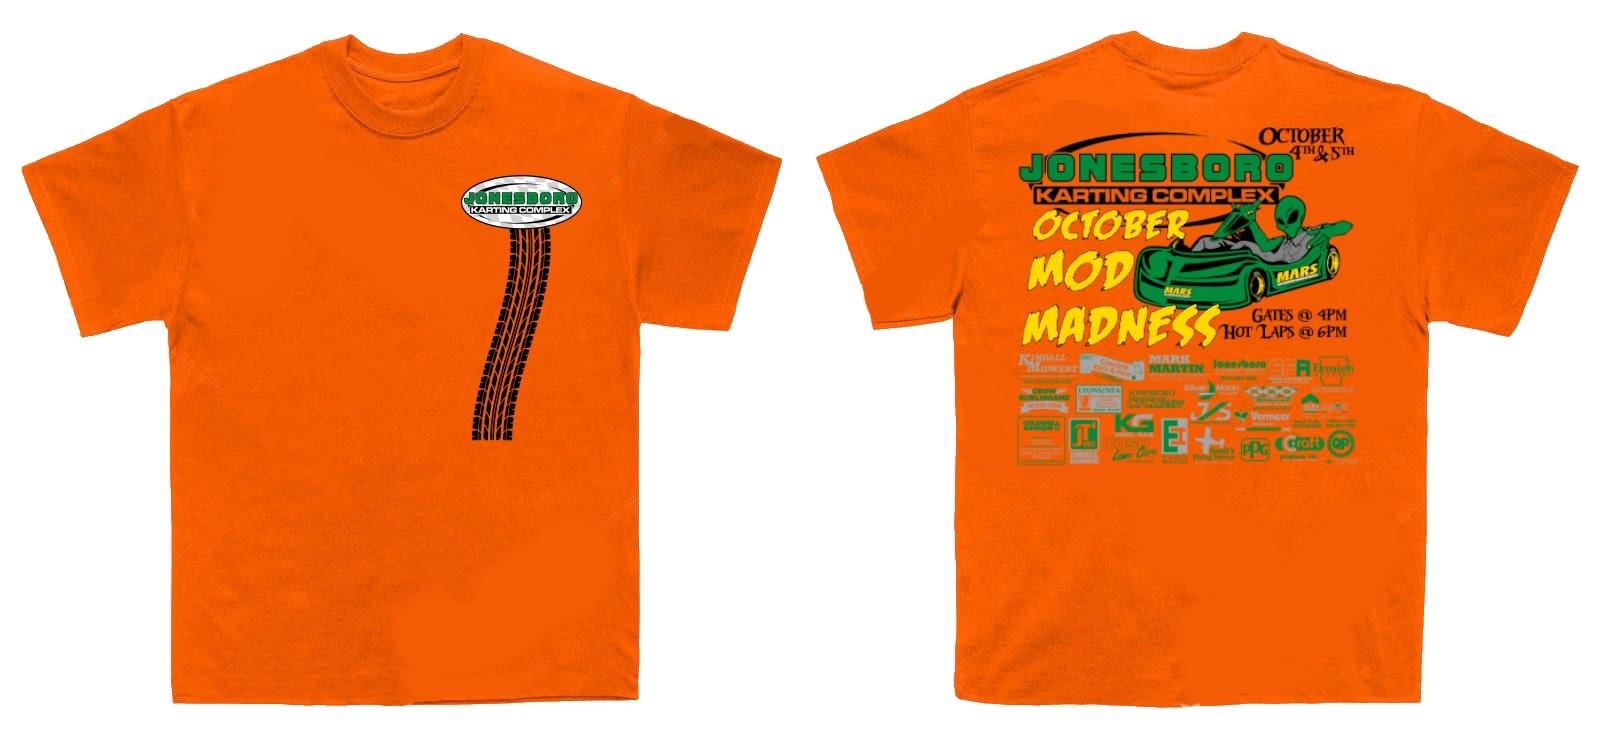 (preorder) 2019 Pro Mod Madness Shirt Adult Small Orange